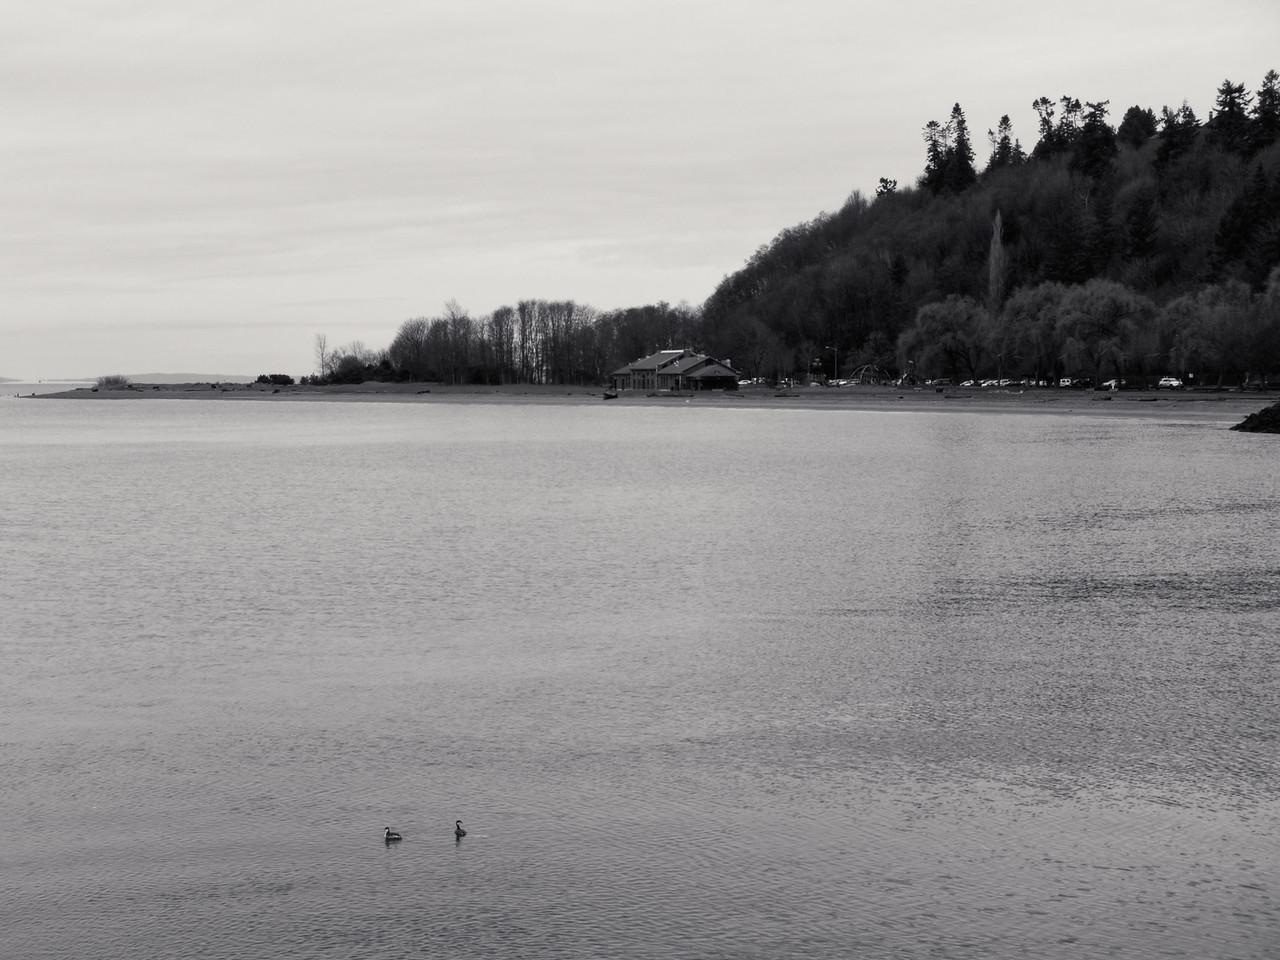 20151226.  View of Golden Gardens Park from Corinthian Yacht Club, Seattle WA.